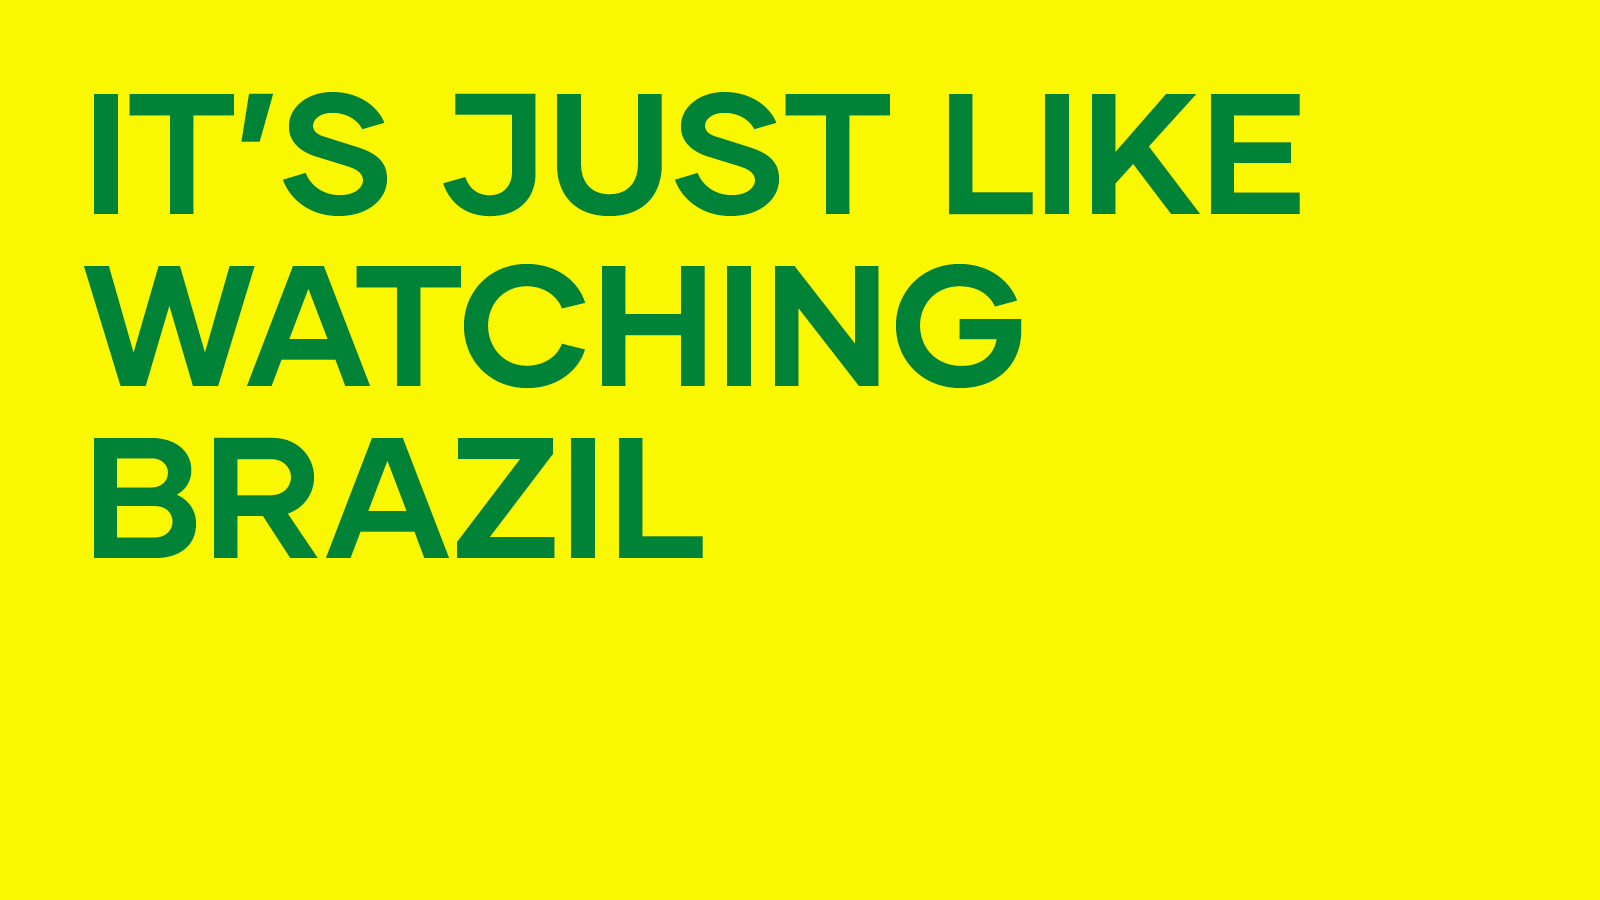 branding-identity-design-sport-football-graphics-dinkit-artwork-prints-posters-gallery-milton-keynes-london-1